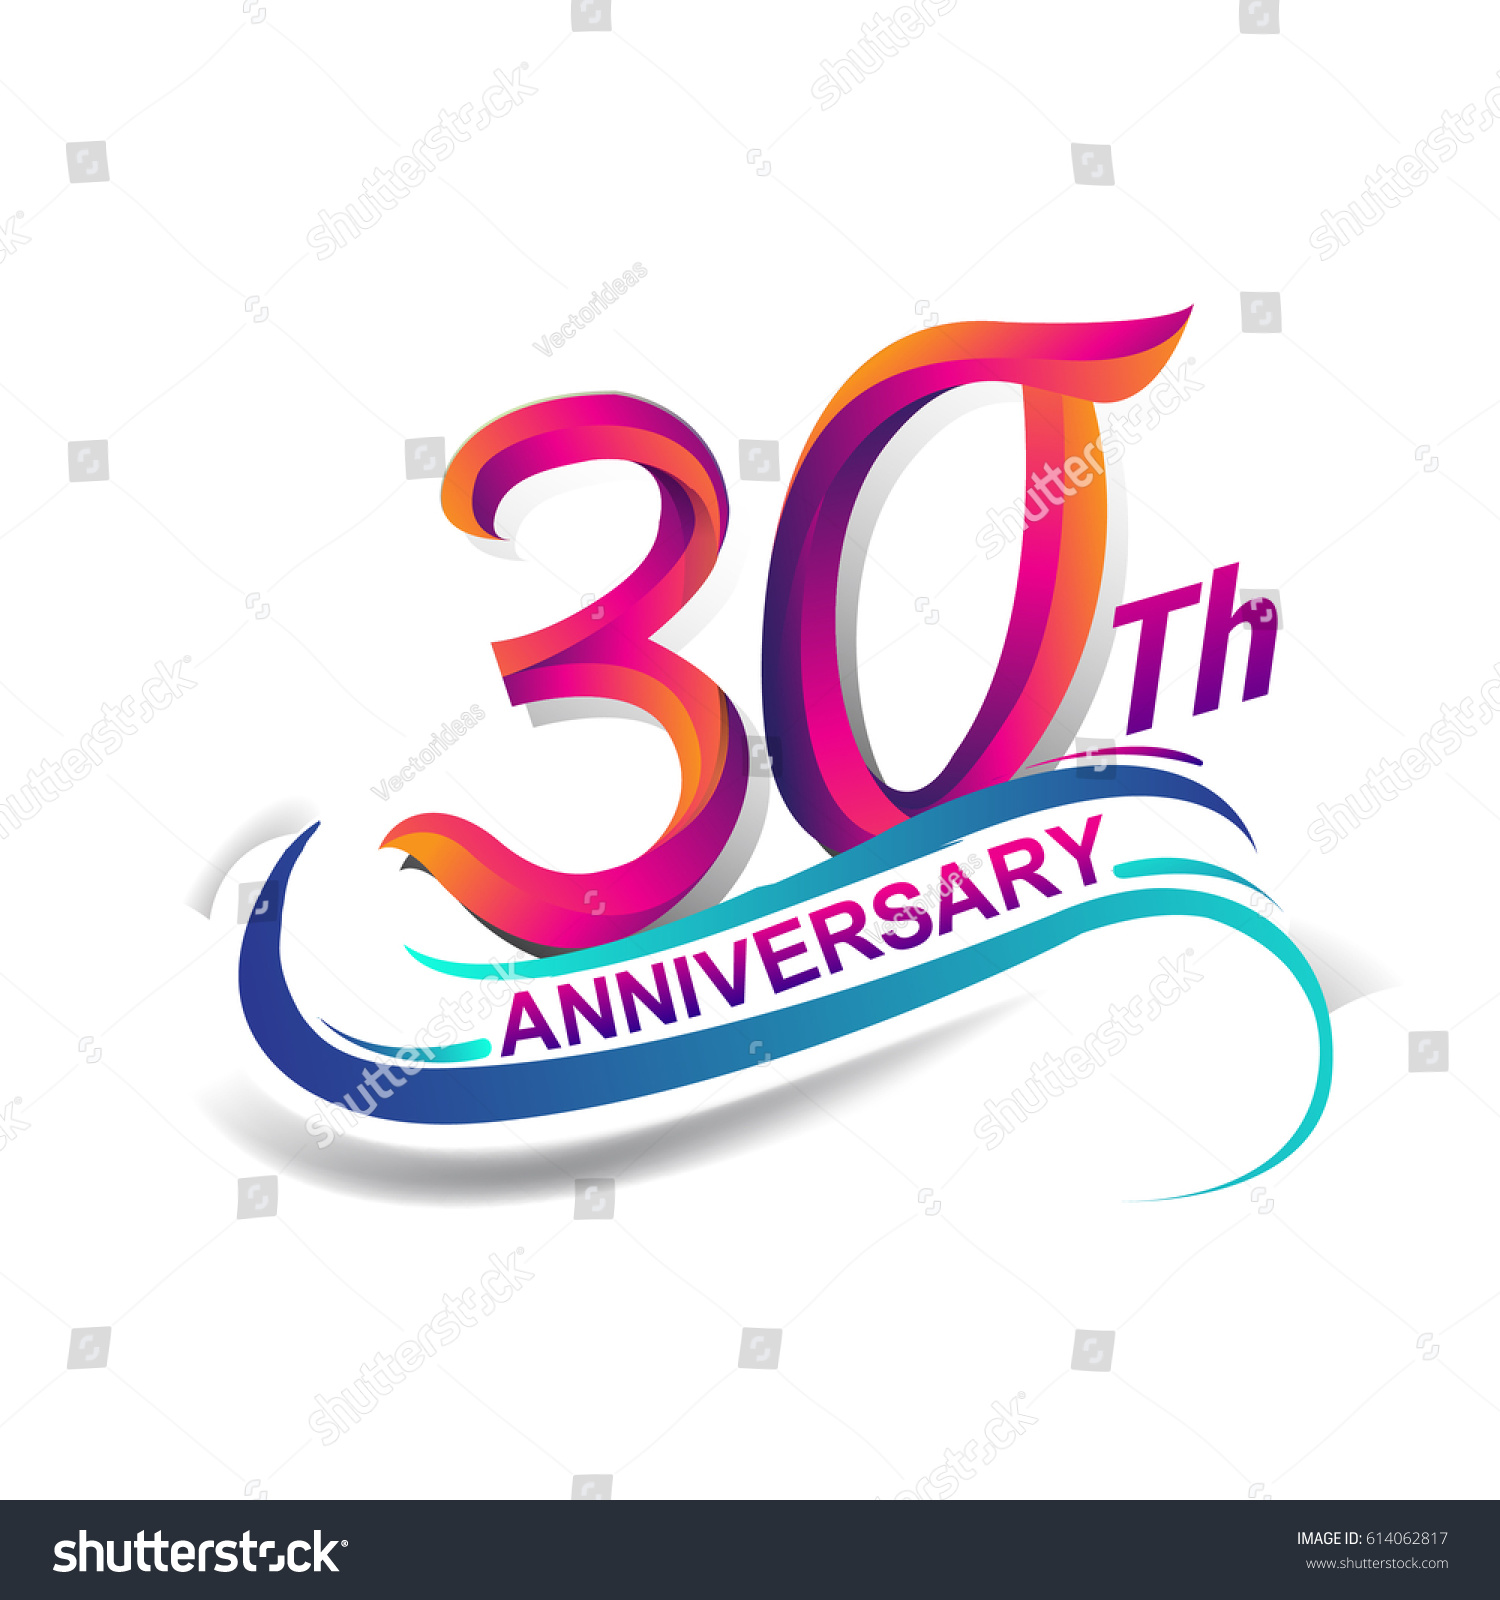 30 Year Anniversary Symbol: 30th Anniversary Celebration Logotype Blue Red Stock